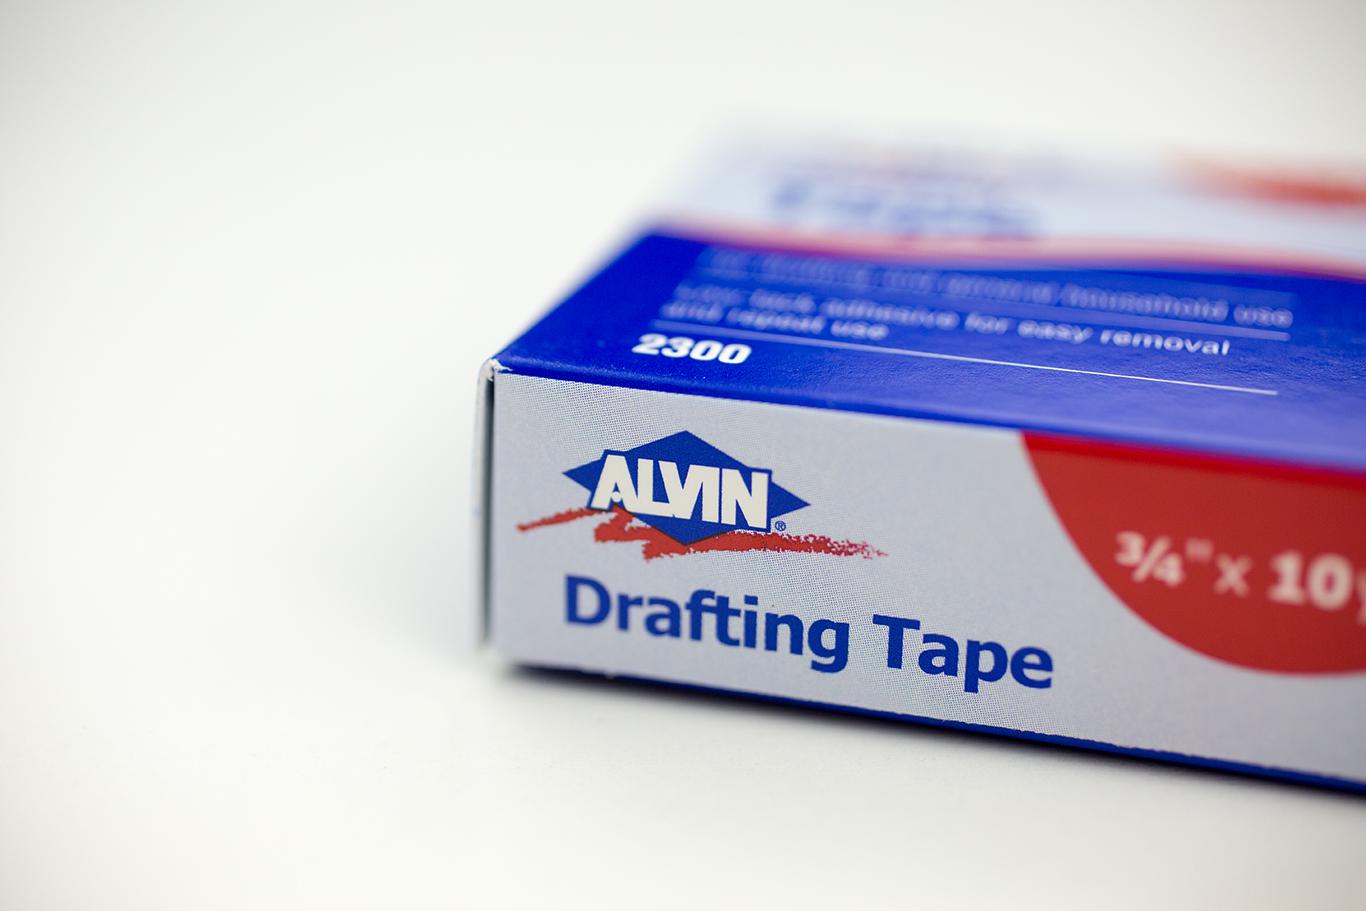 Alvin® Drafting Tape Item No. 2300